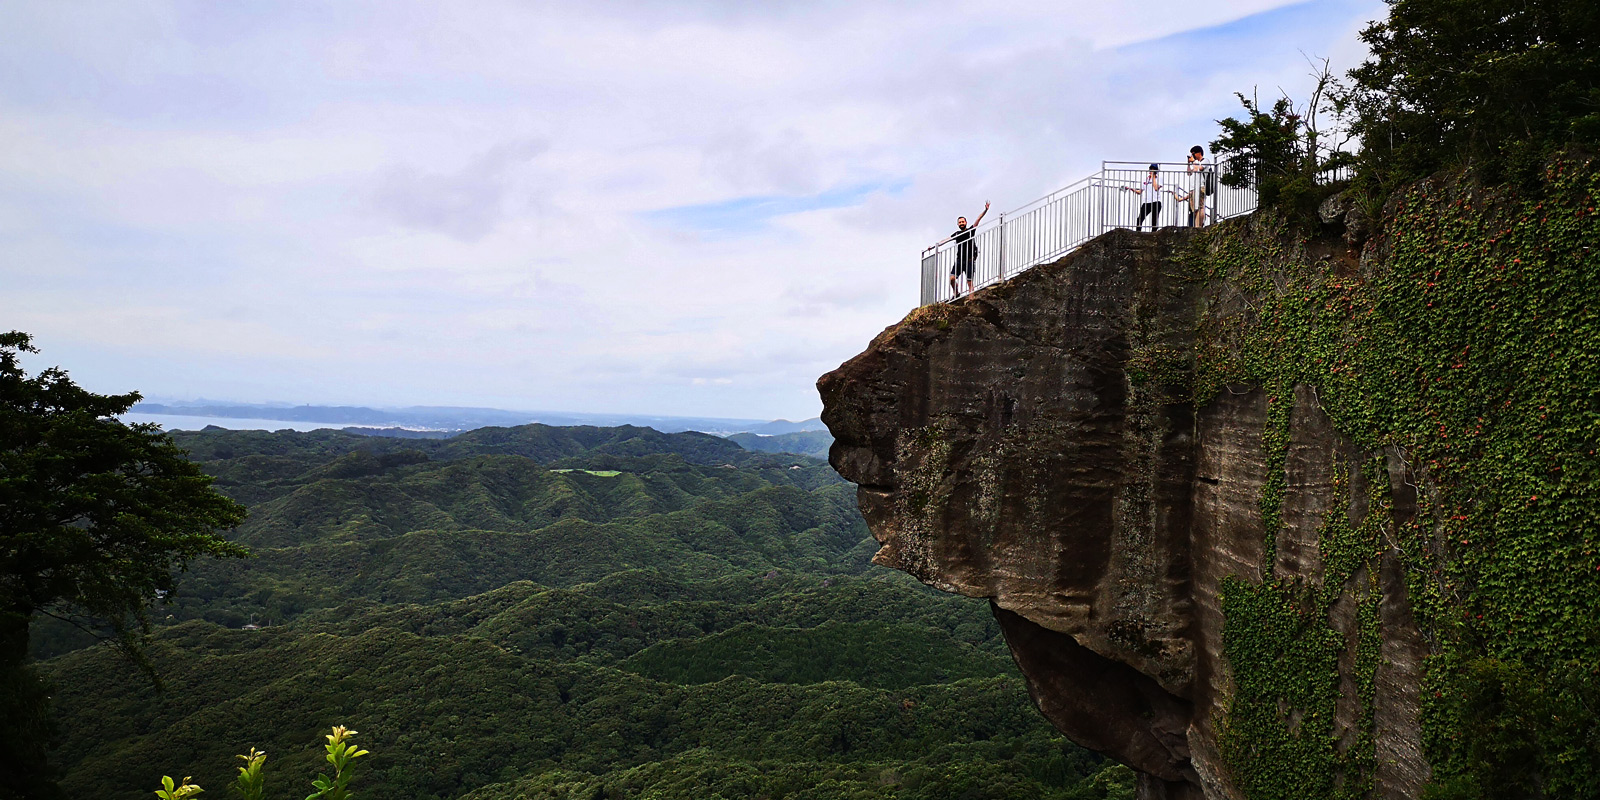 Vue de Nokogiriyama